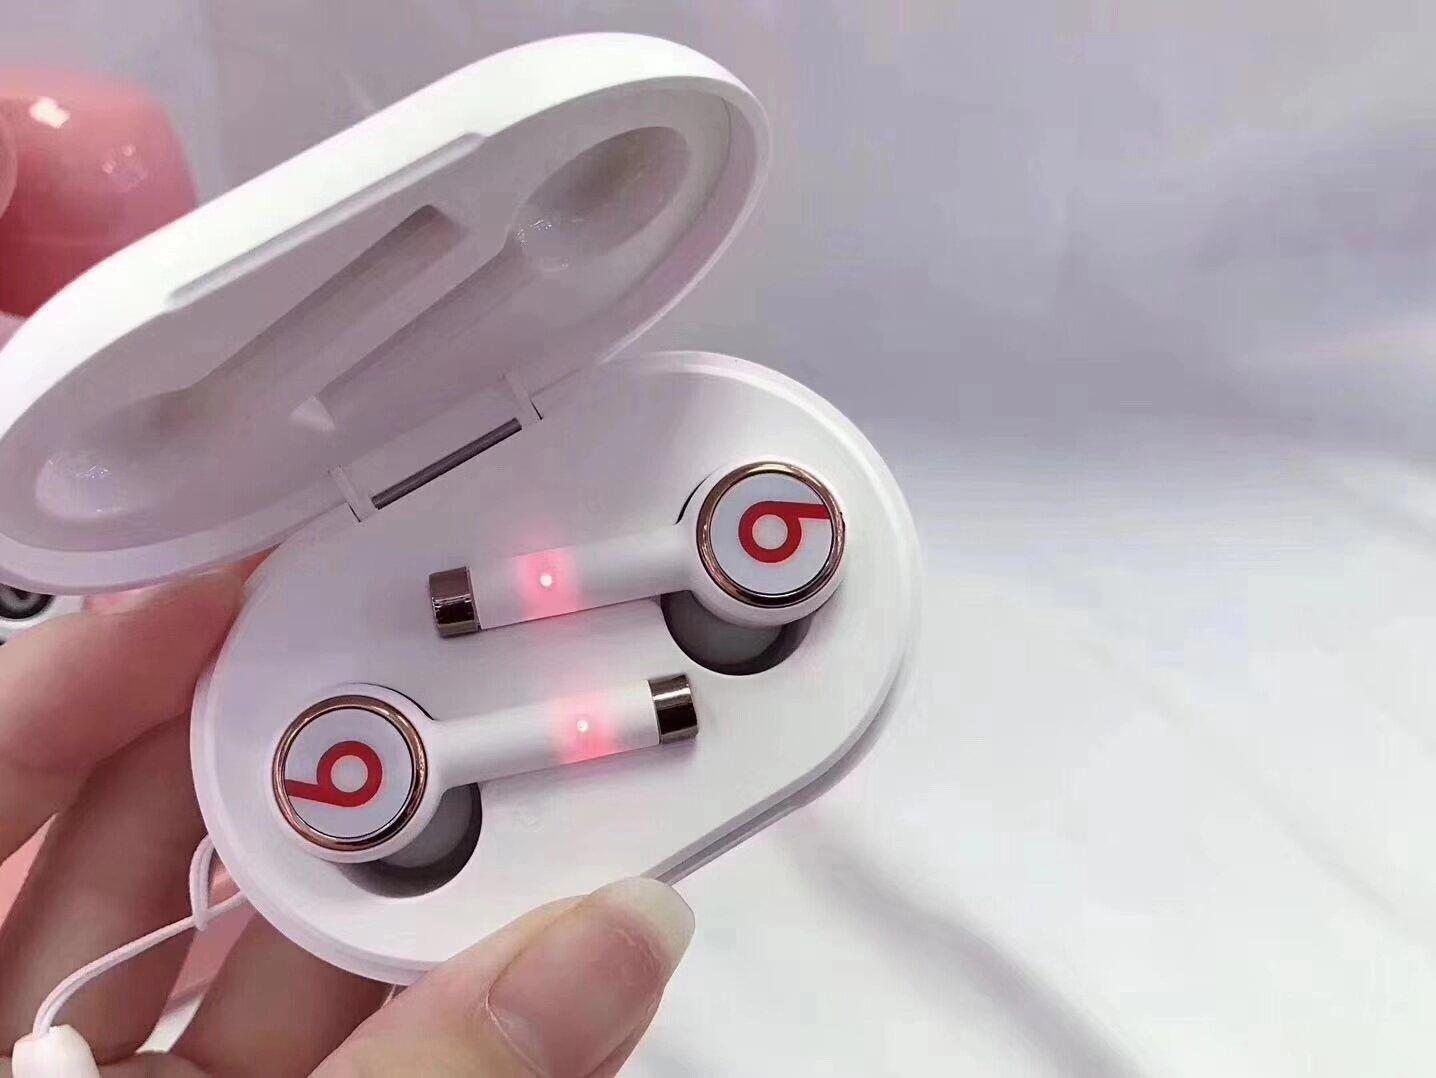 Beats Wireless tour3 ใหม่ ชุดหูฟังพร้อมกล่องชาร์จชุดหูฟังบลูทู ธ ไร้สาย Bluetooth V5.0 ชุดหูฟังไร้สาย IOS Android